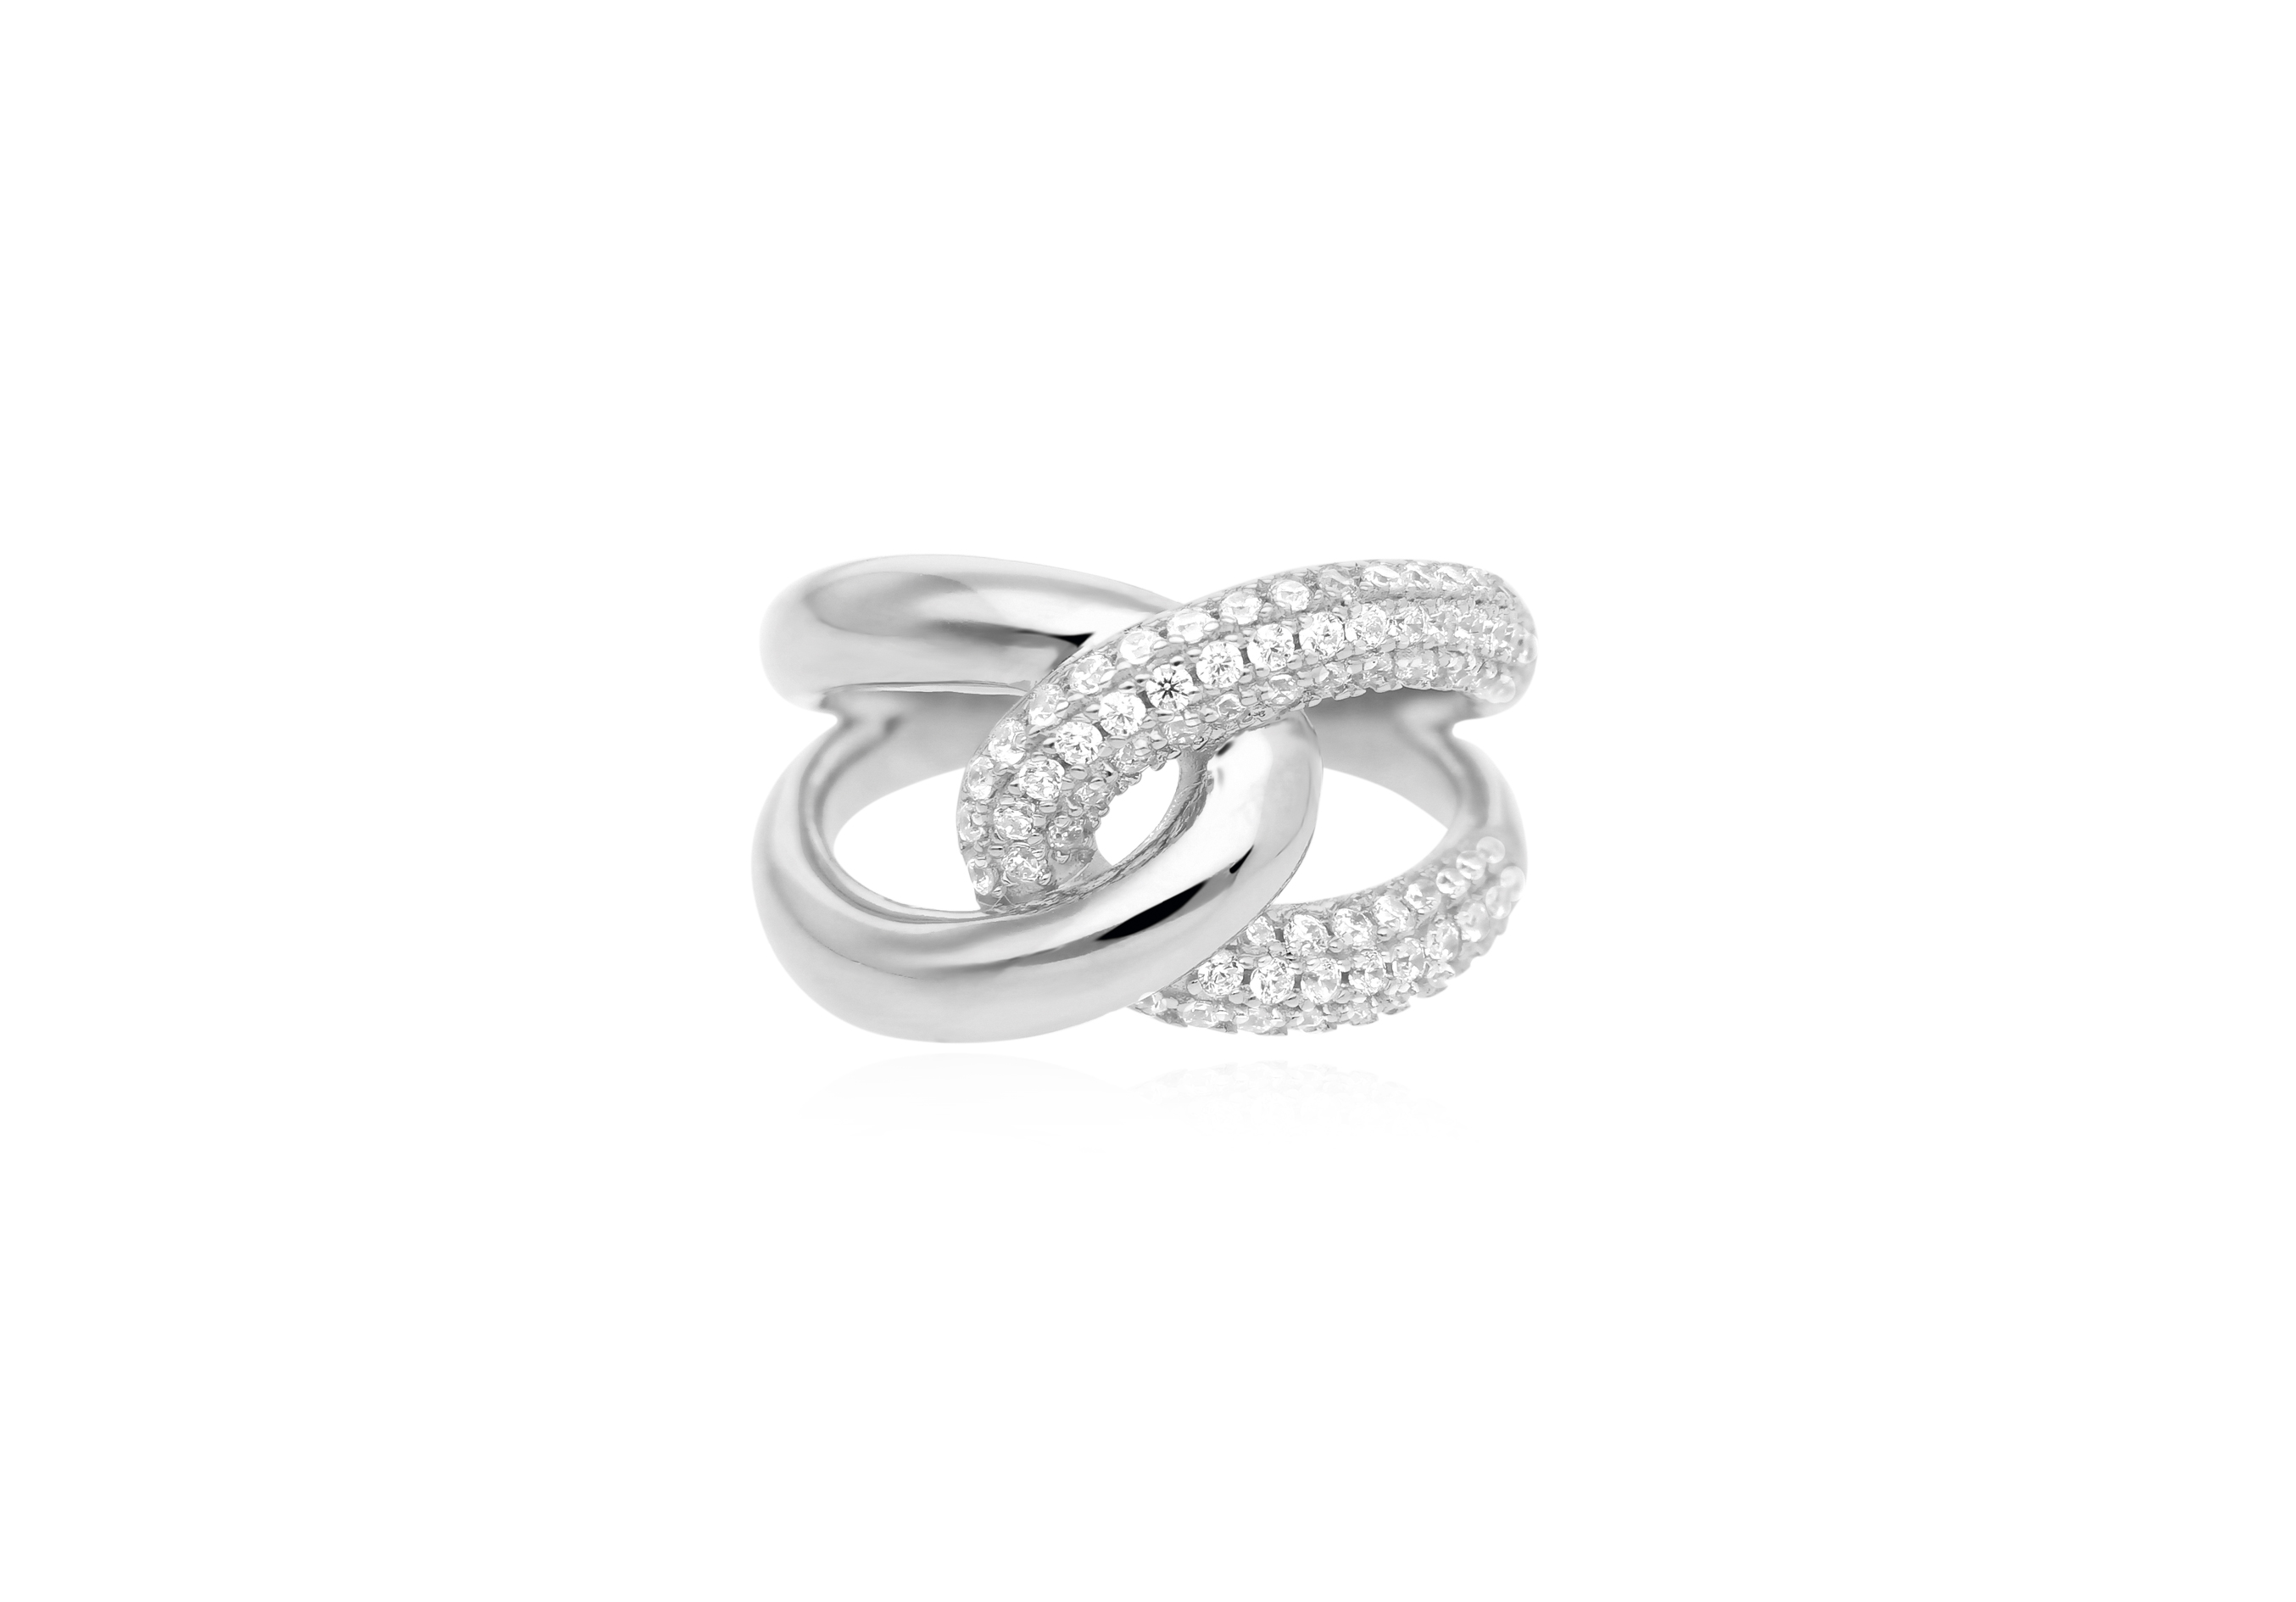 Anello in argento con cubic zirconia